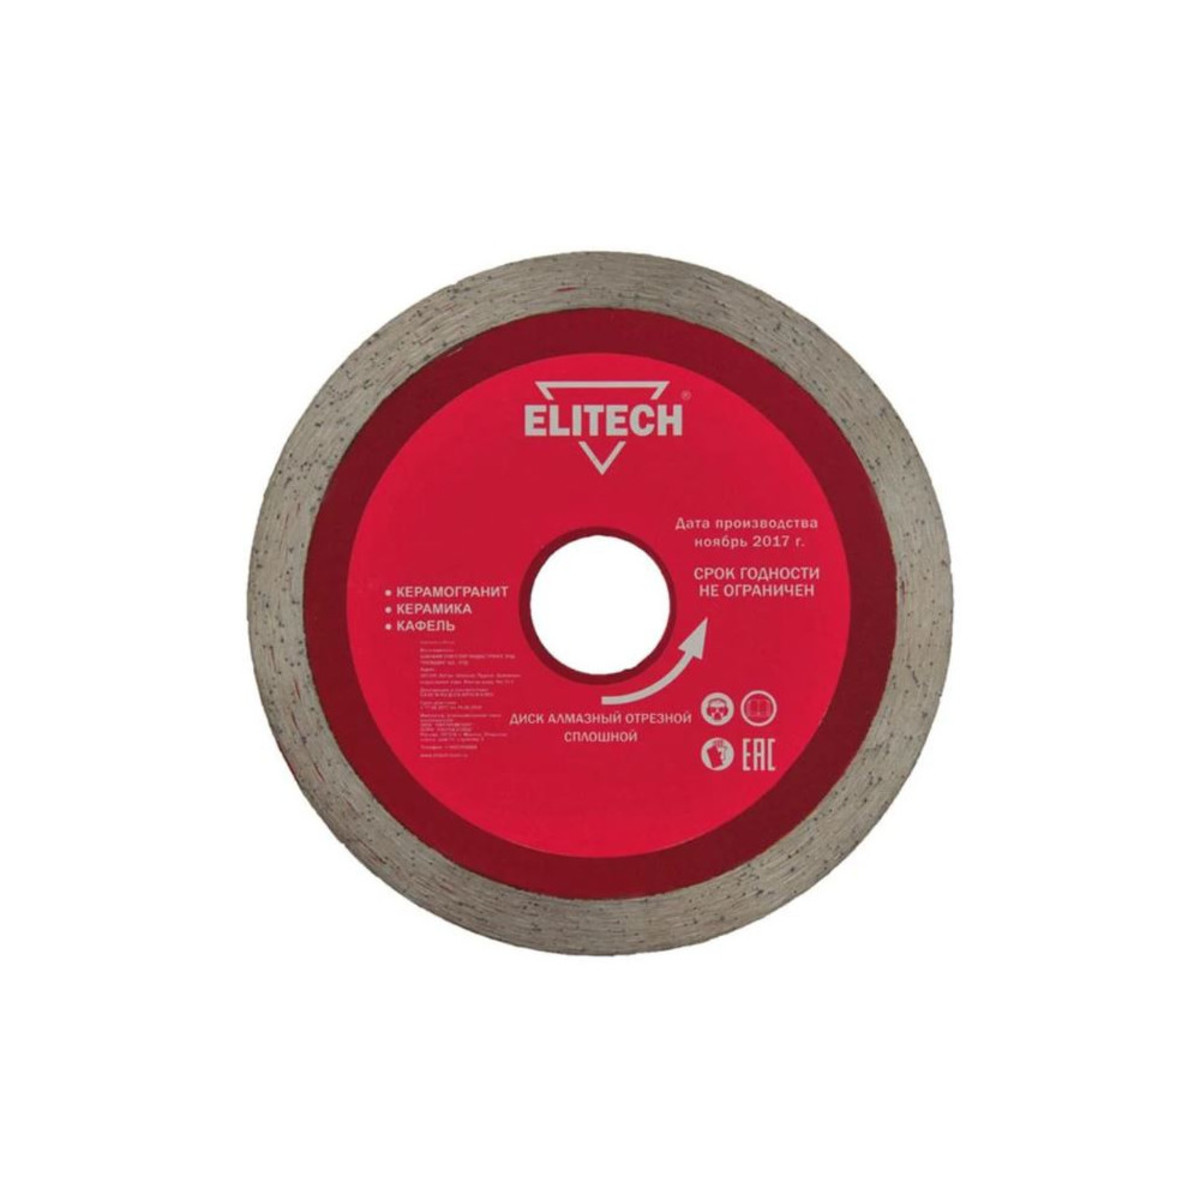 Диск Алмазный Elitech 230Х22 18200577